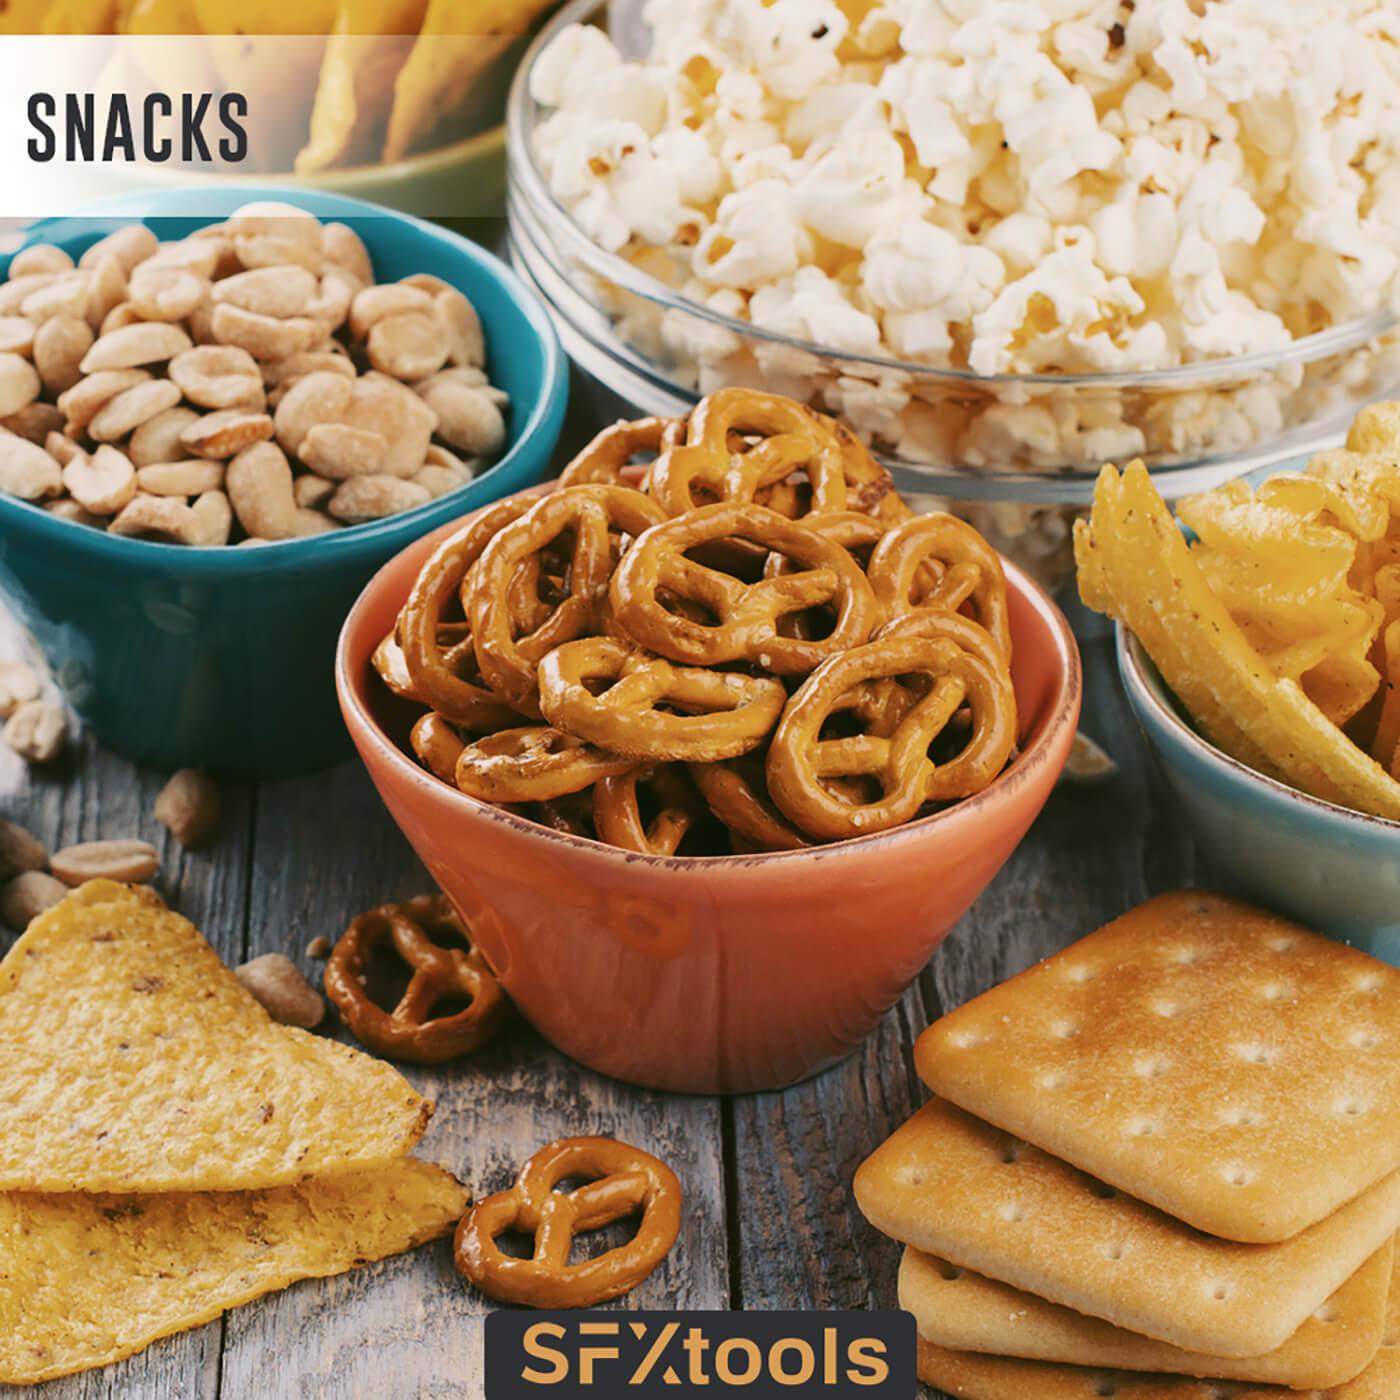 SFXtools - Snacks